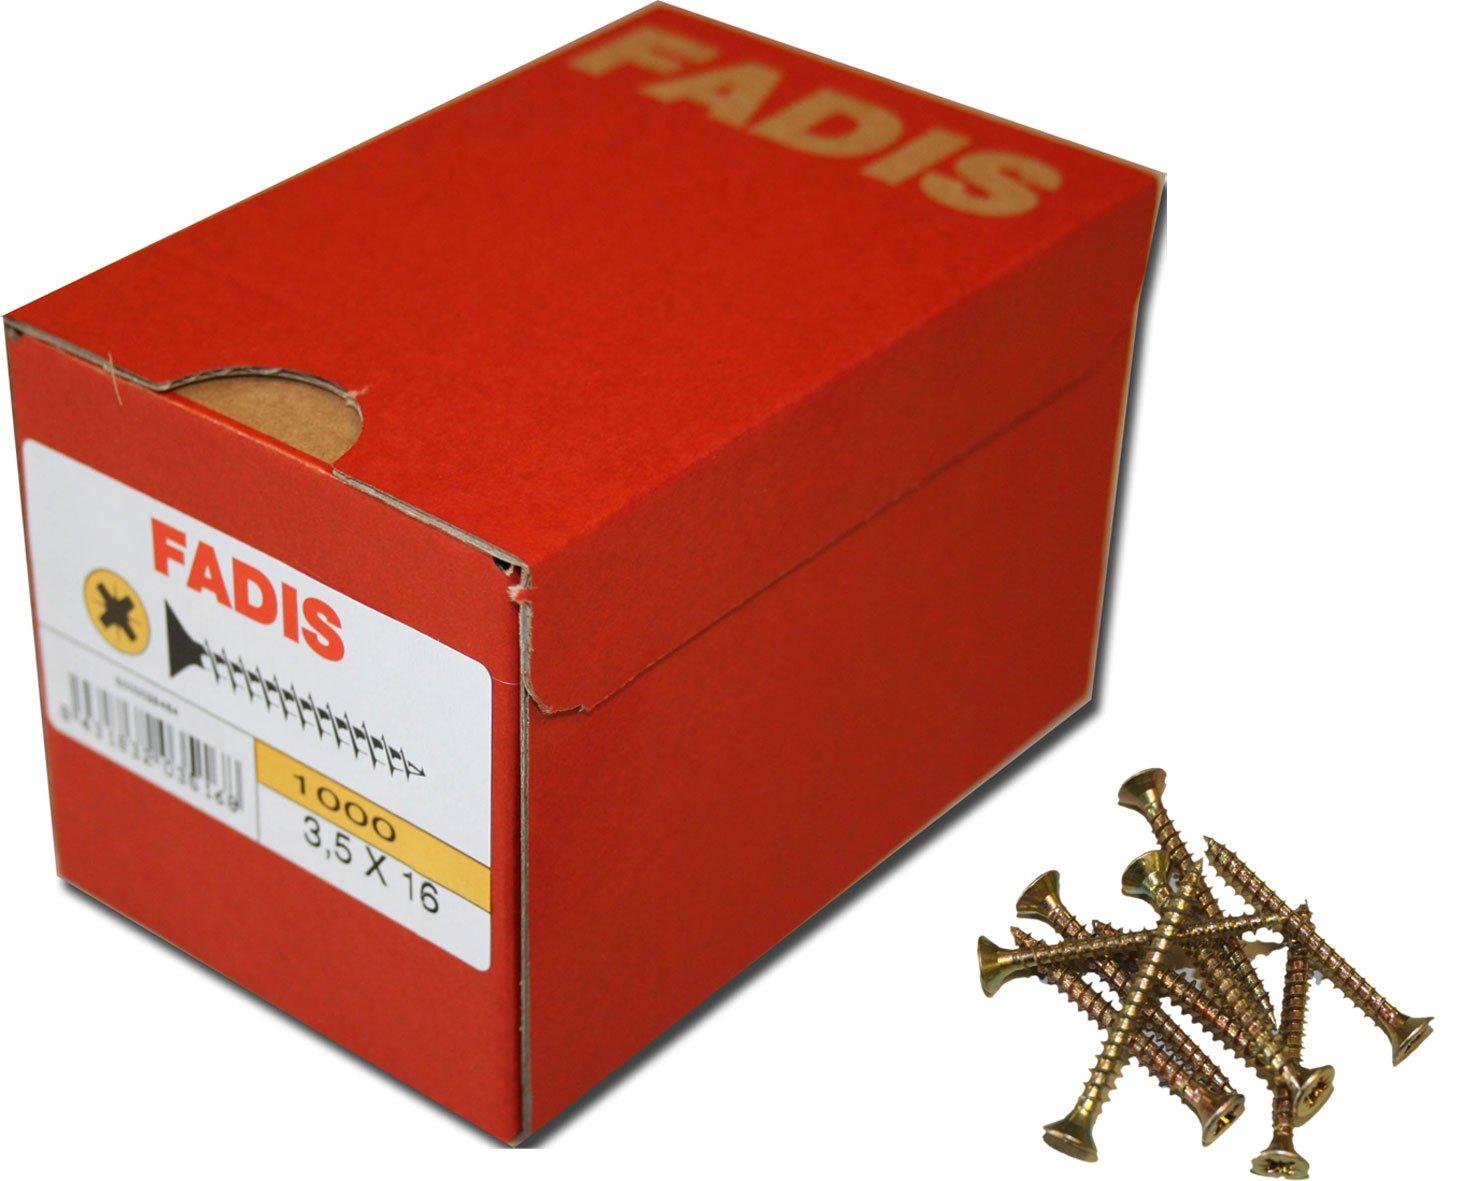 Tornillo Fadis Bicromatado 5X50 200Pz. Fadis